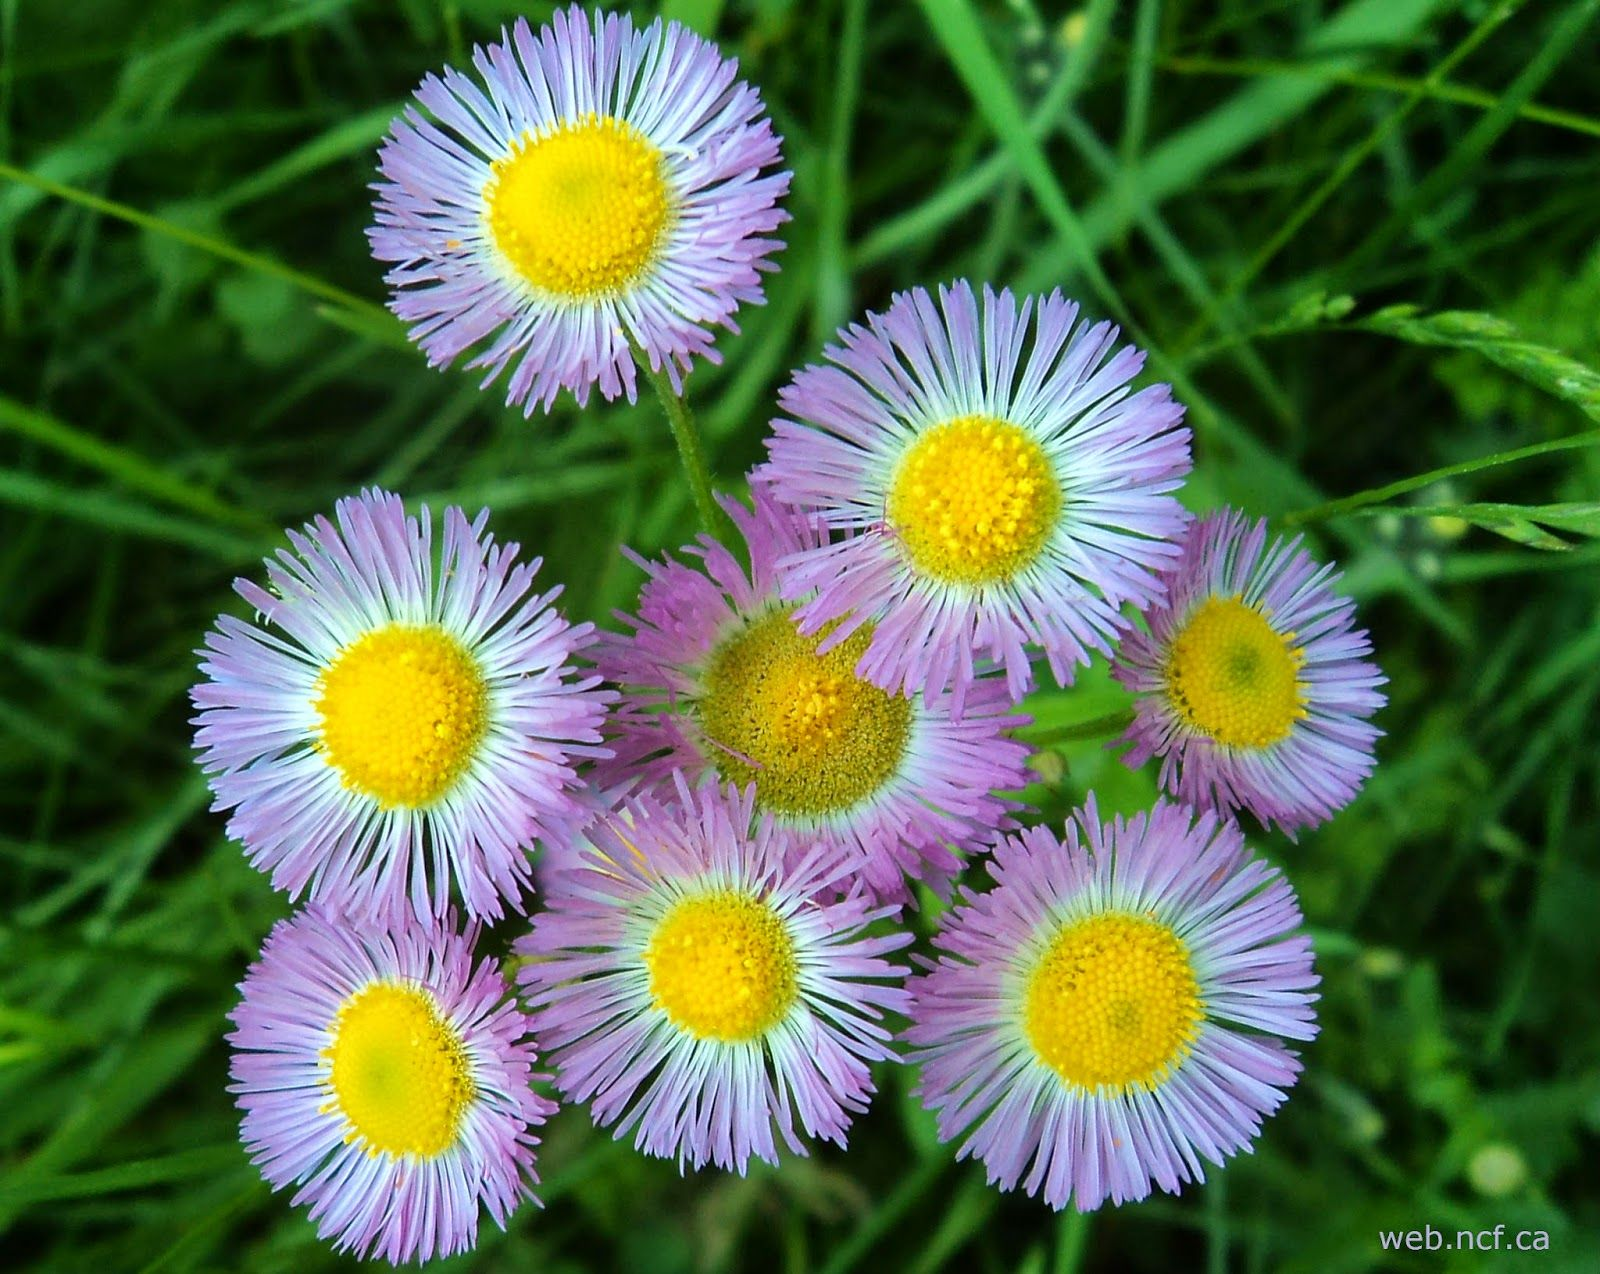 Fleabane in the Yard Garden, Wild flowers, Patio garden